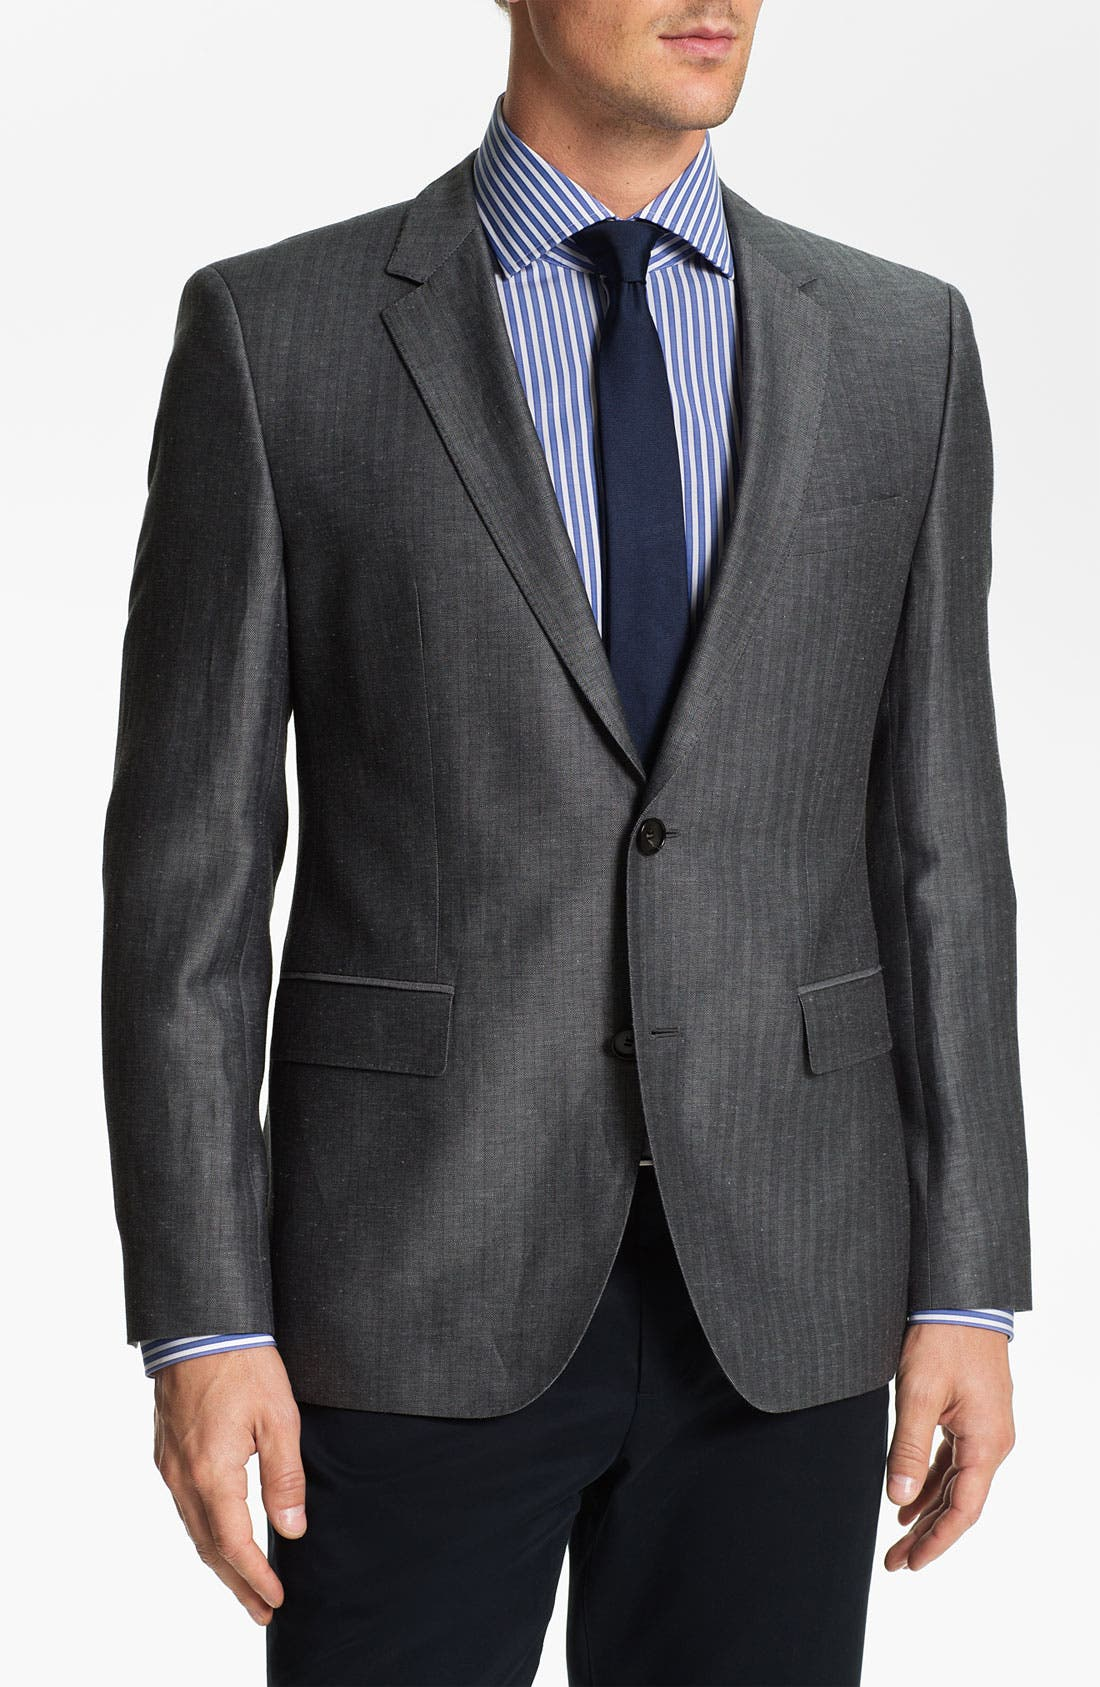 Alternate Image 1 Selected - BOSS Black 'James' Trim Fit Blazer